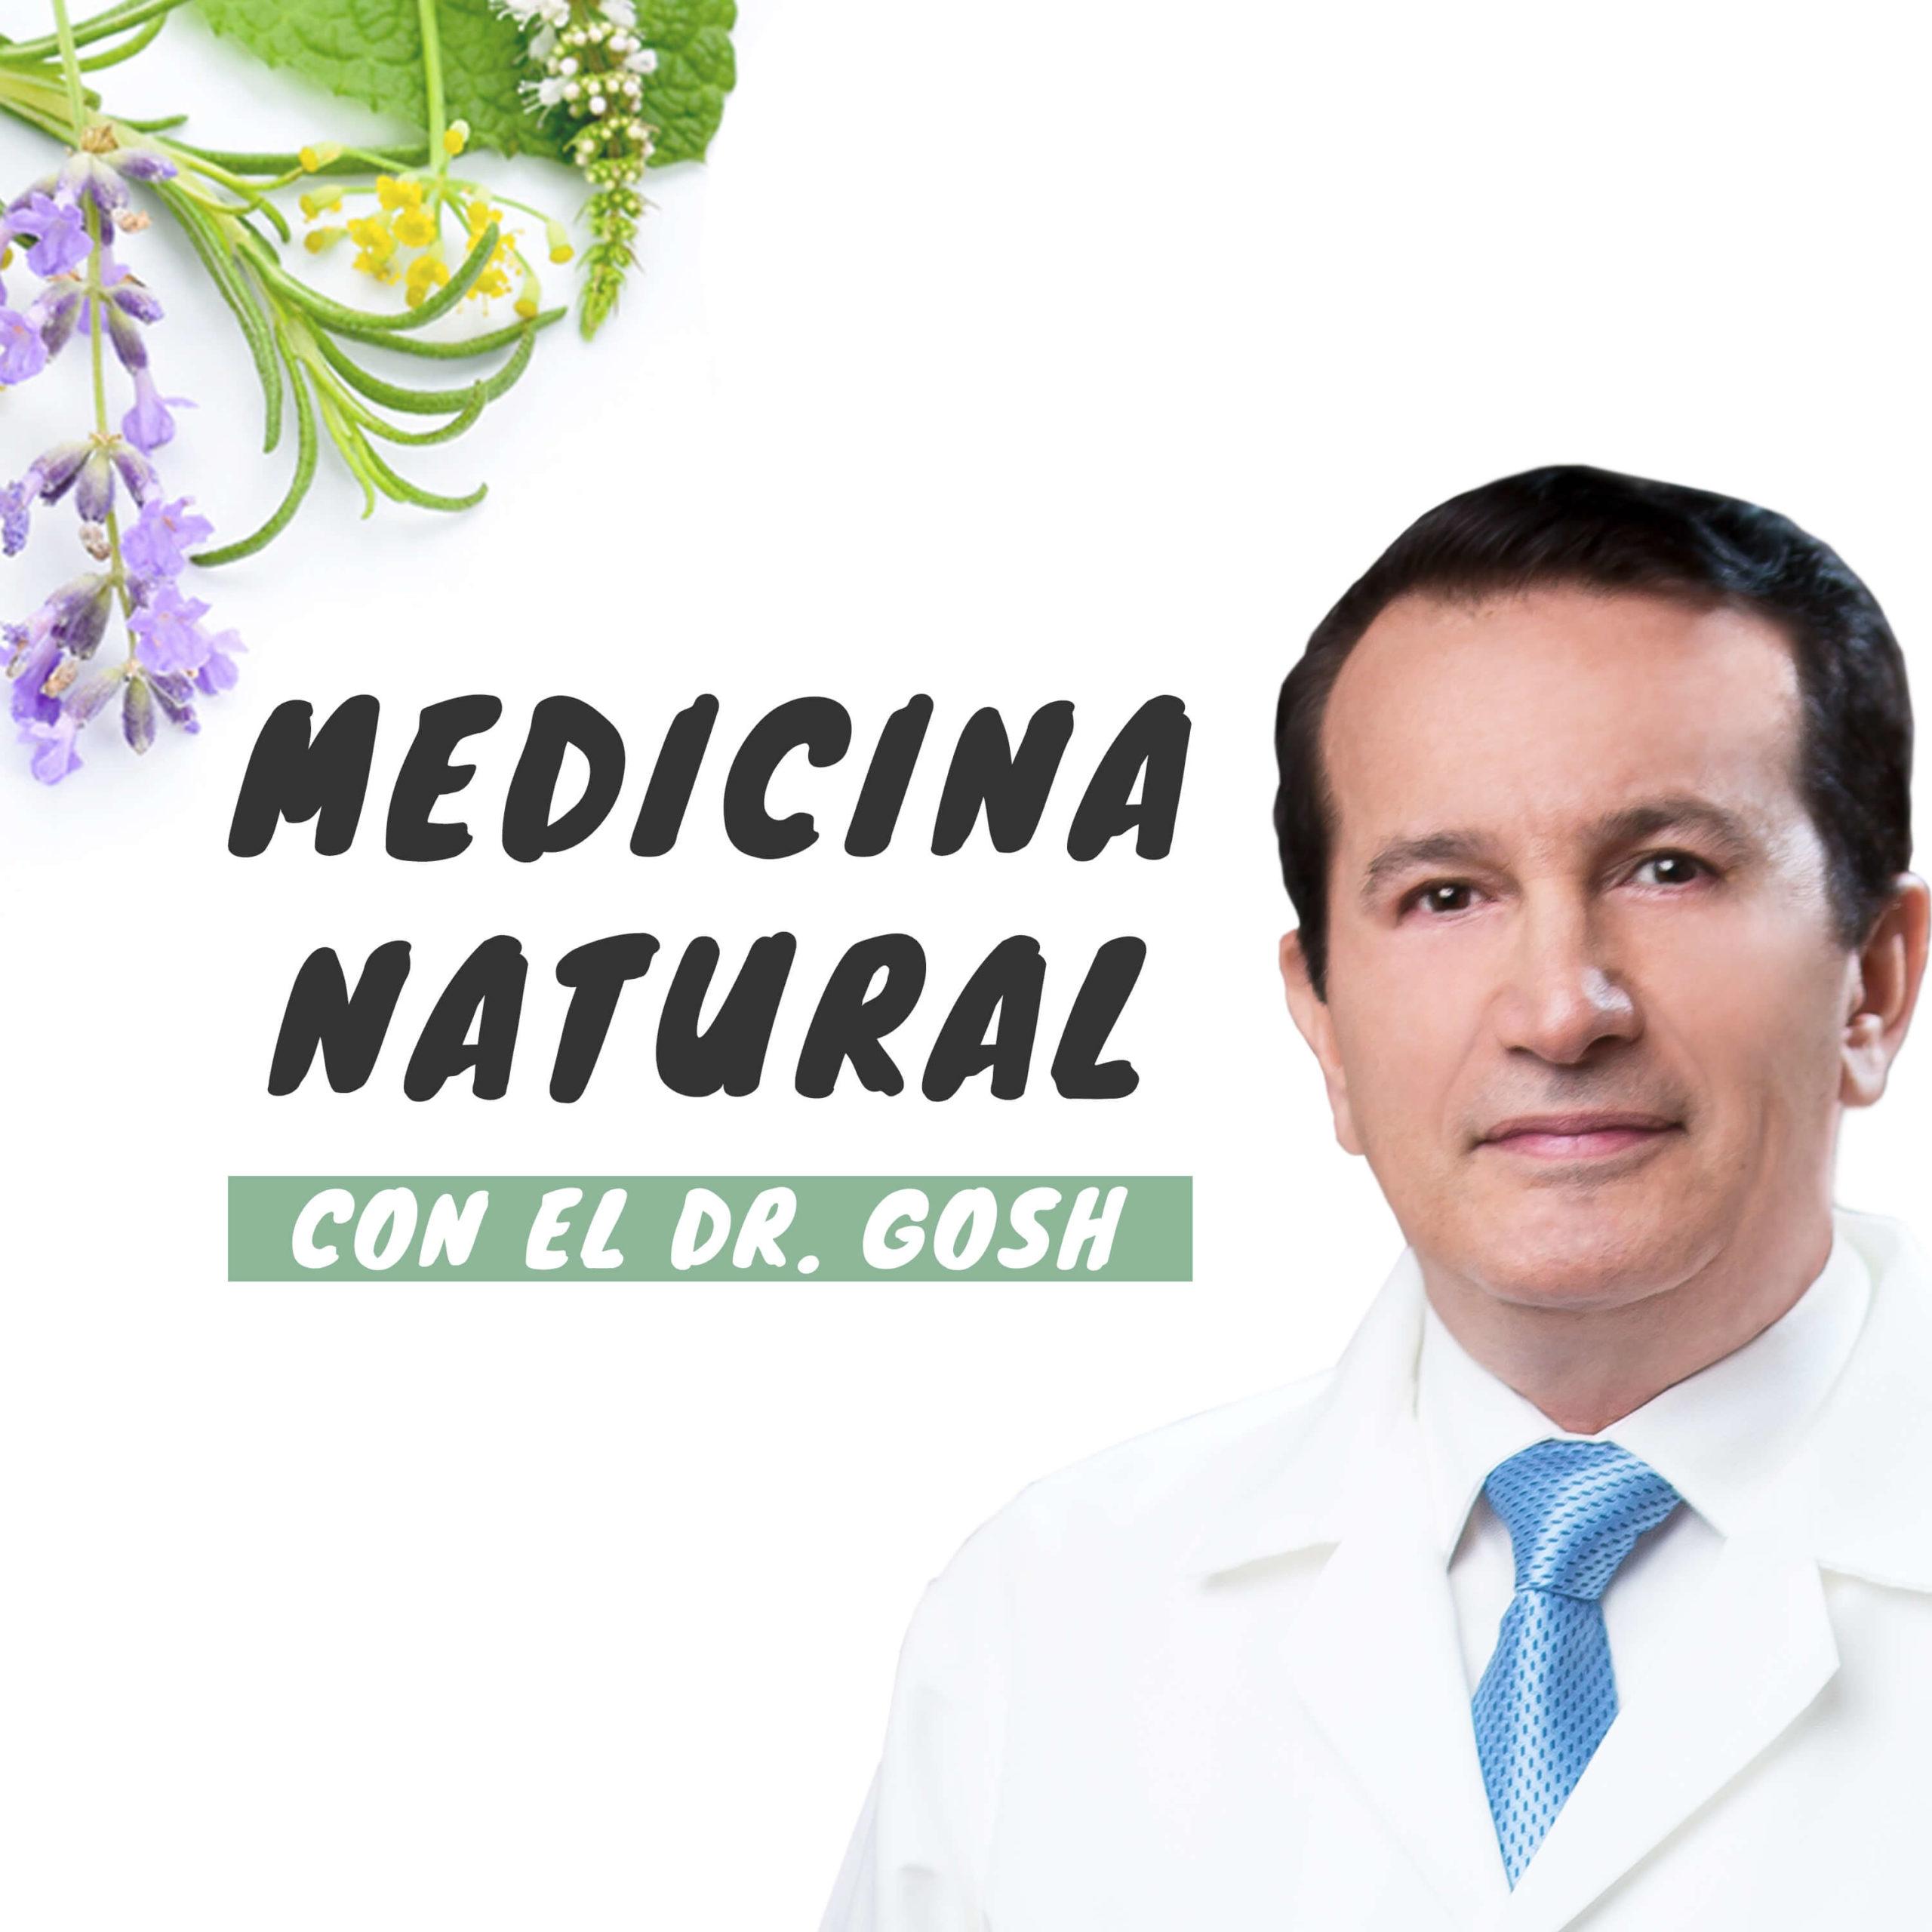 Medicina Natural con el Dr. Gosh